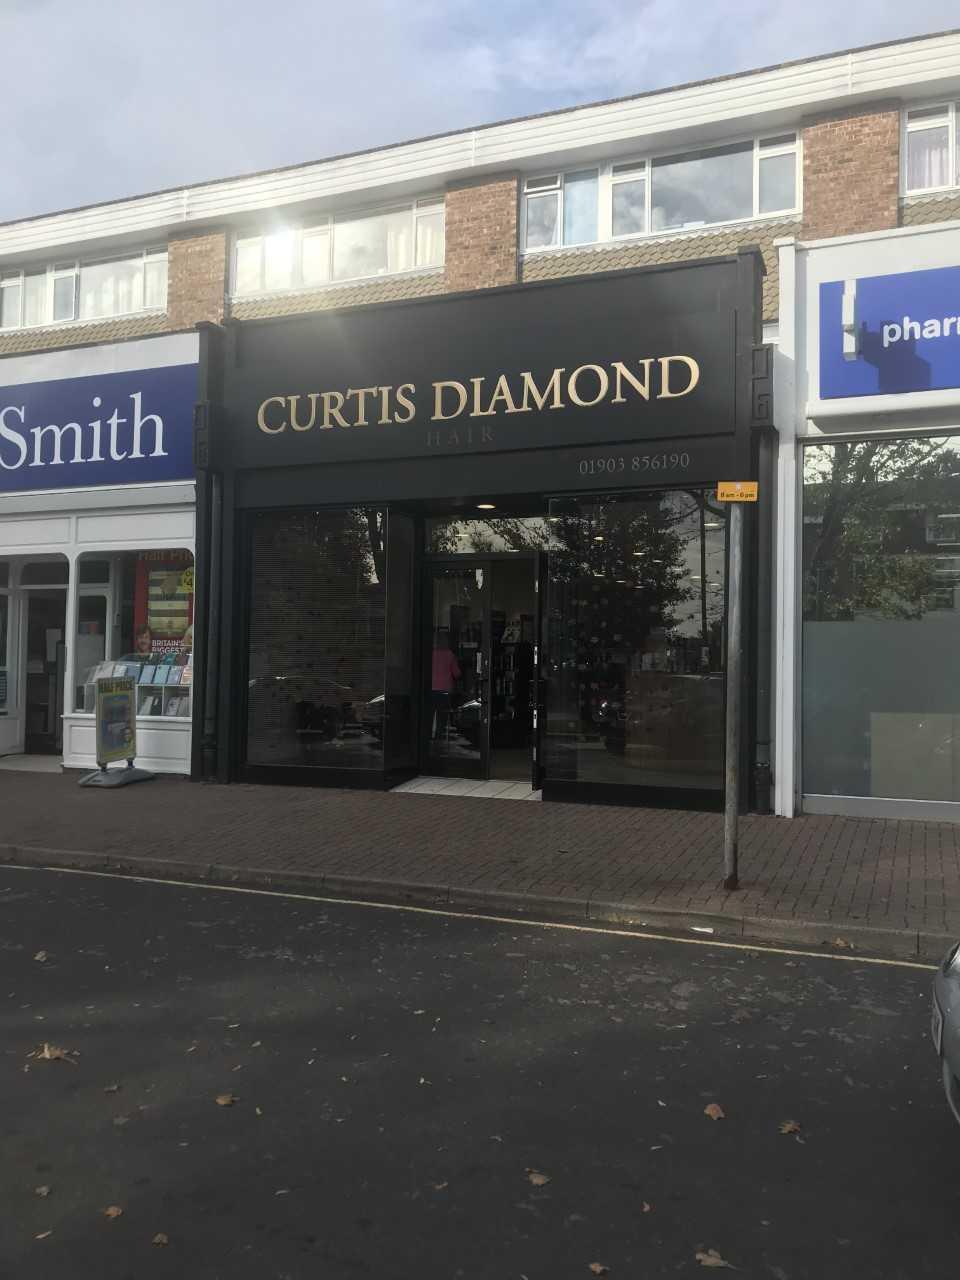 Curtis Diamond in Rustington